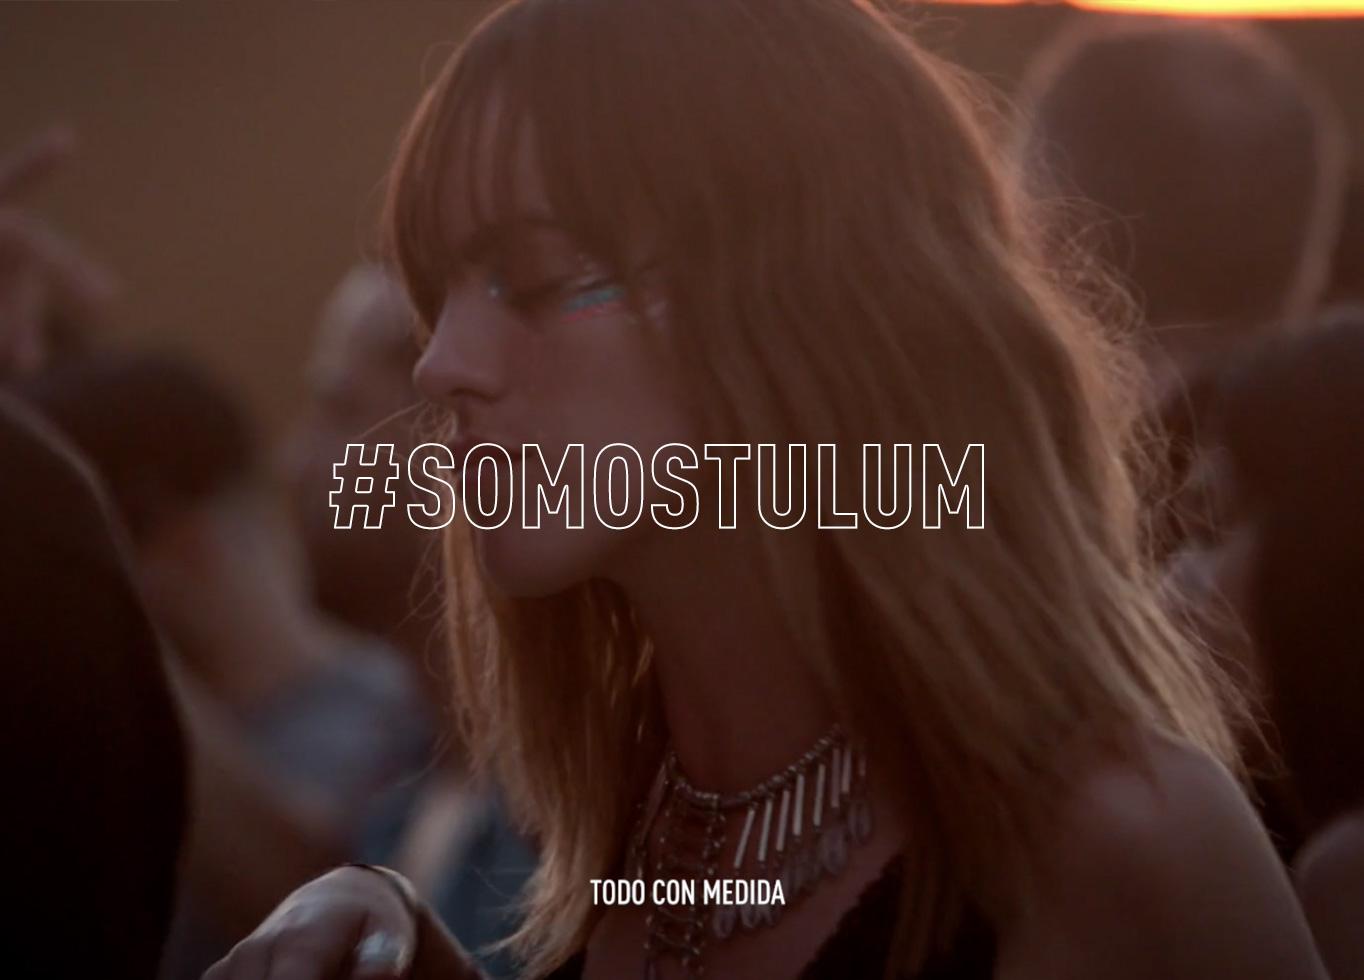 #SomosTulum